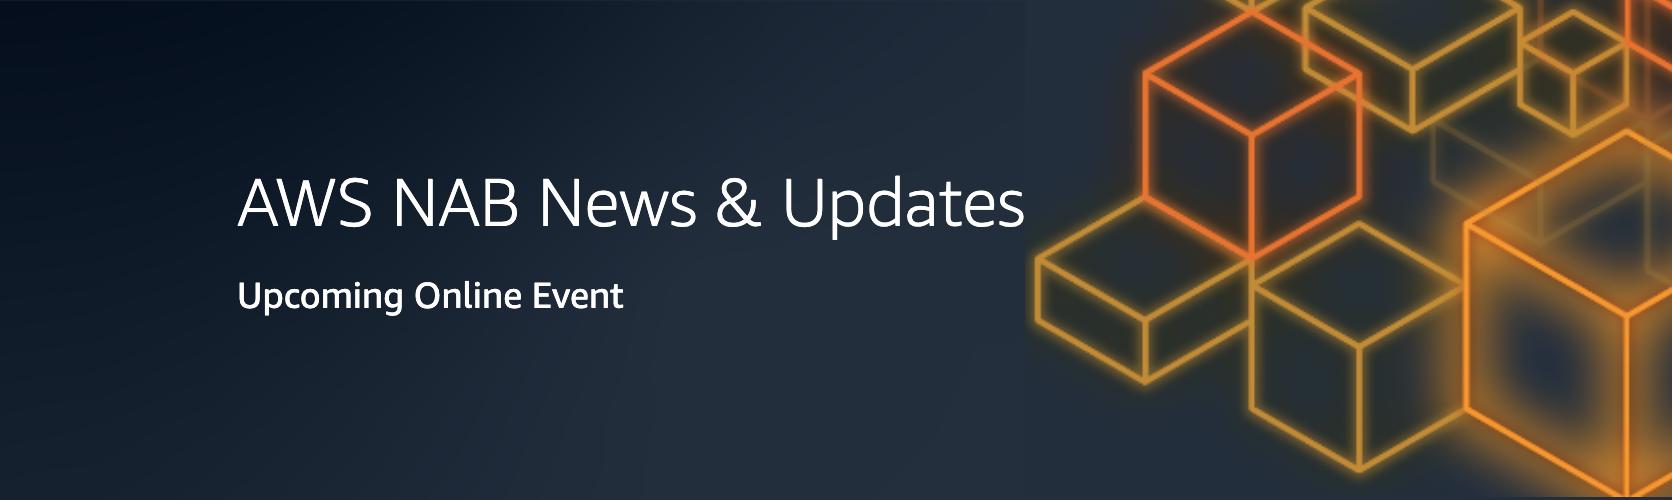 AWS NAB News & Updates